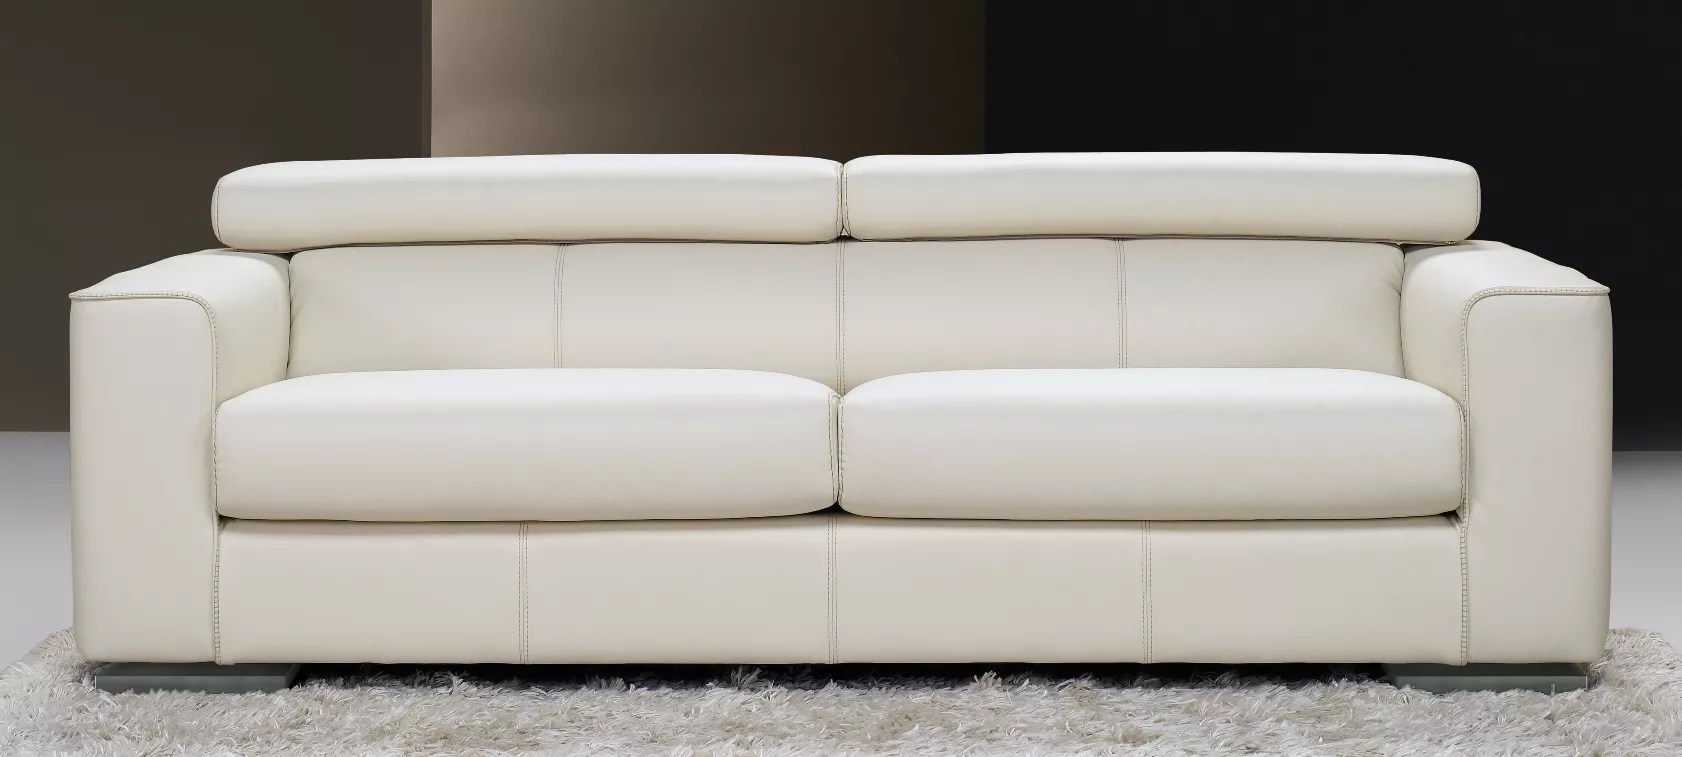 modern sofa sets toronto grey tufted target luxury sofas contemporary furniture ideas ...